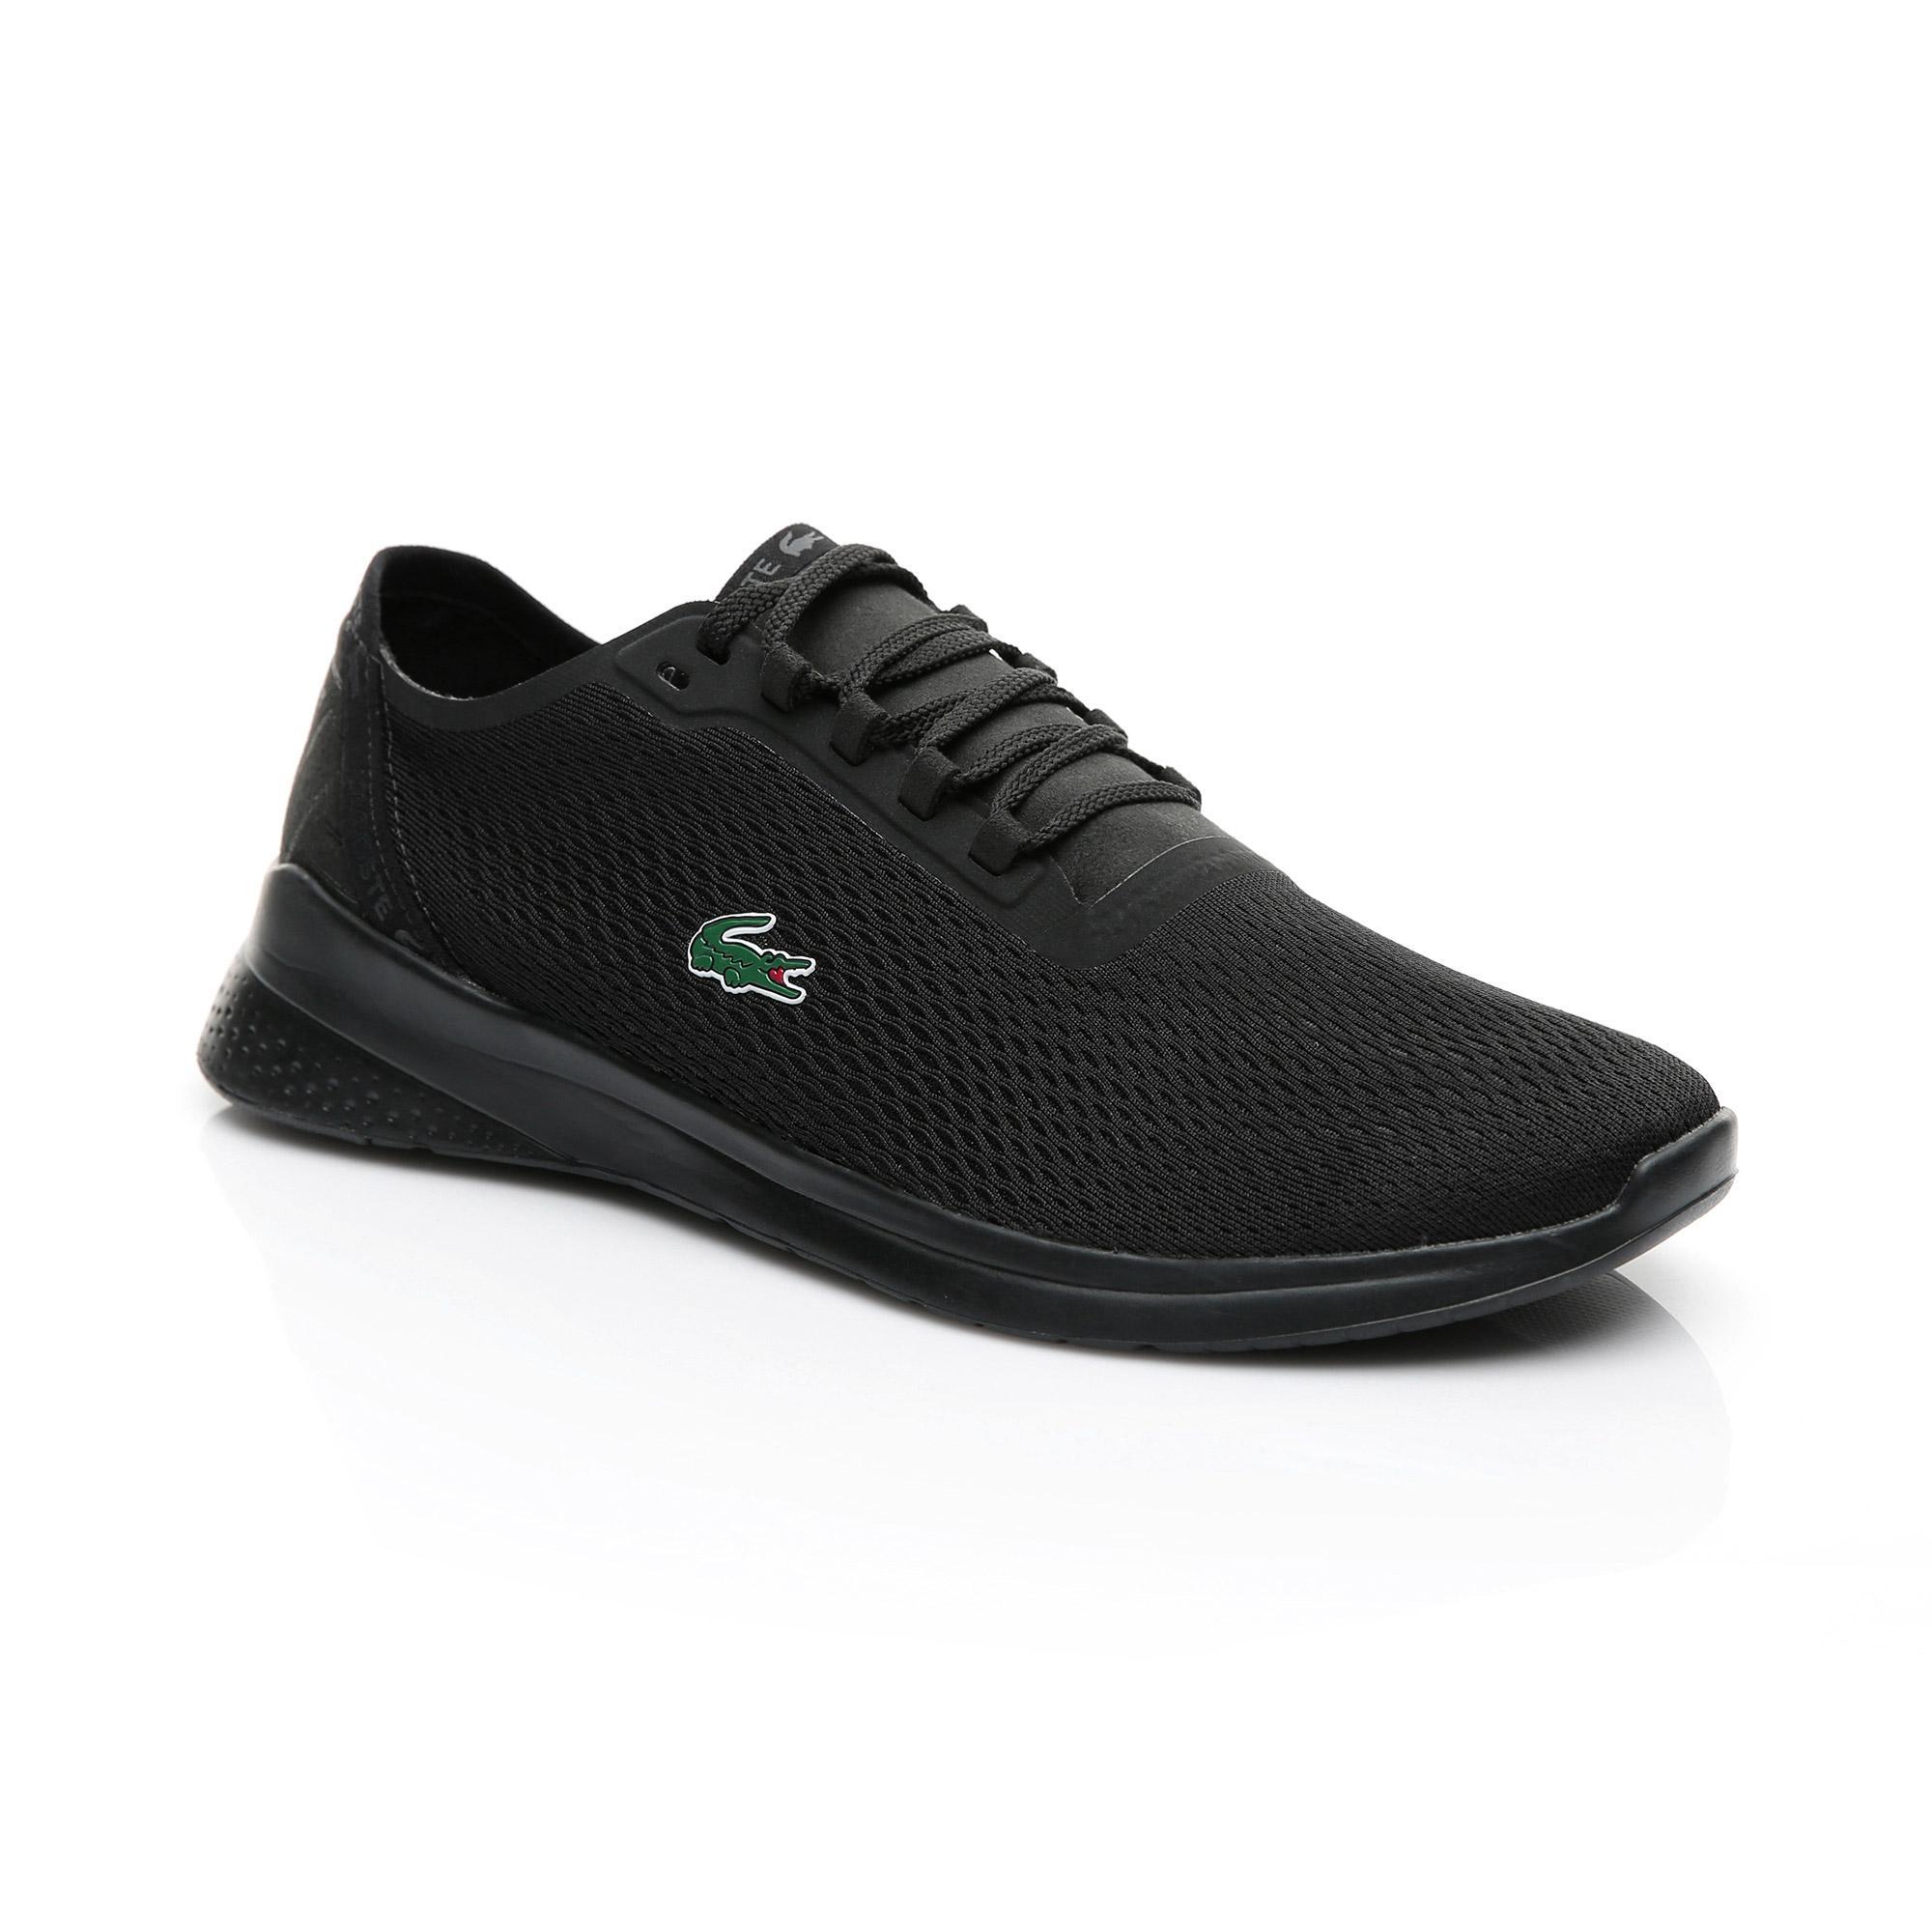 Lacoste кросівки чоловічі LT Fit